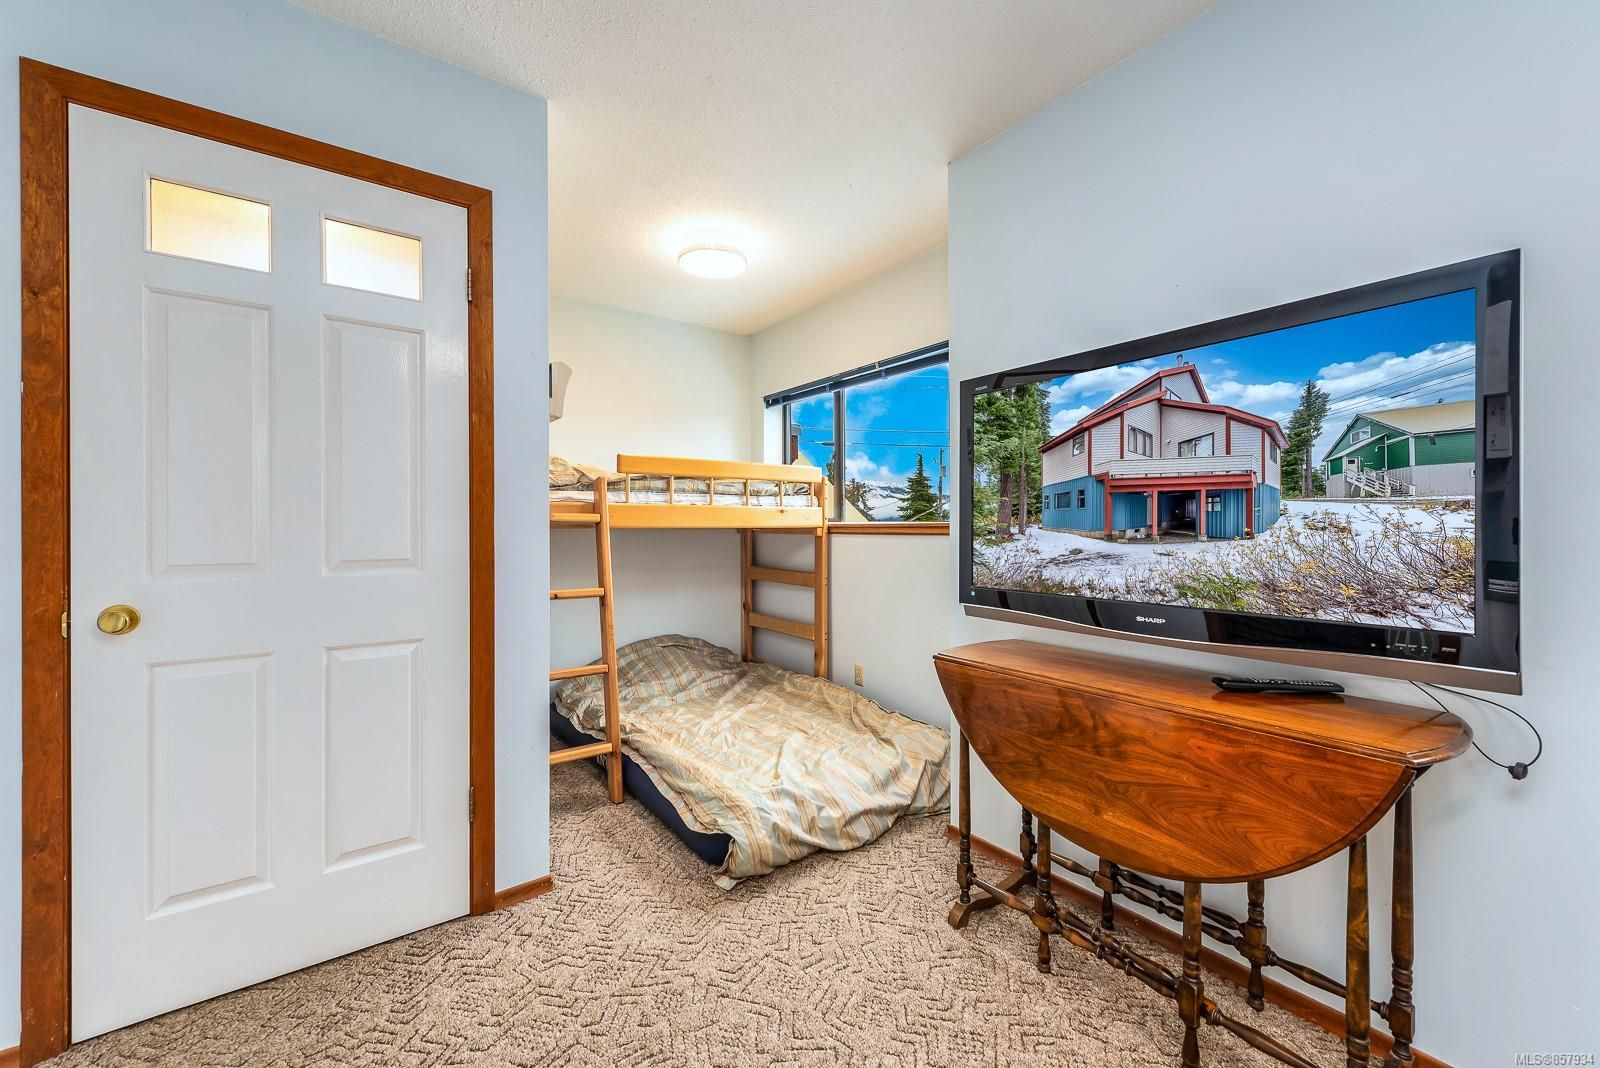 Photo 22: Photos: 998 STRATA Way in : CV Mt Washington House for sale (Comox Valley)  : MLS®# 857934